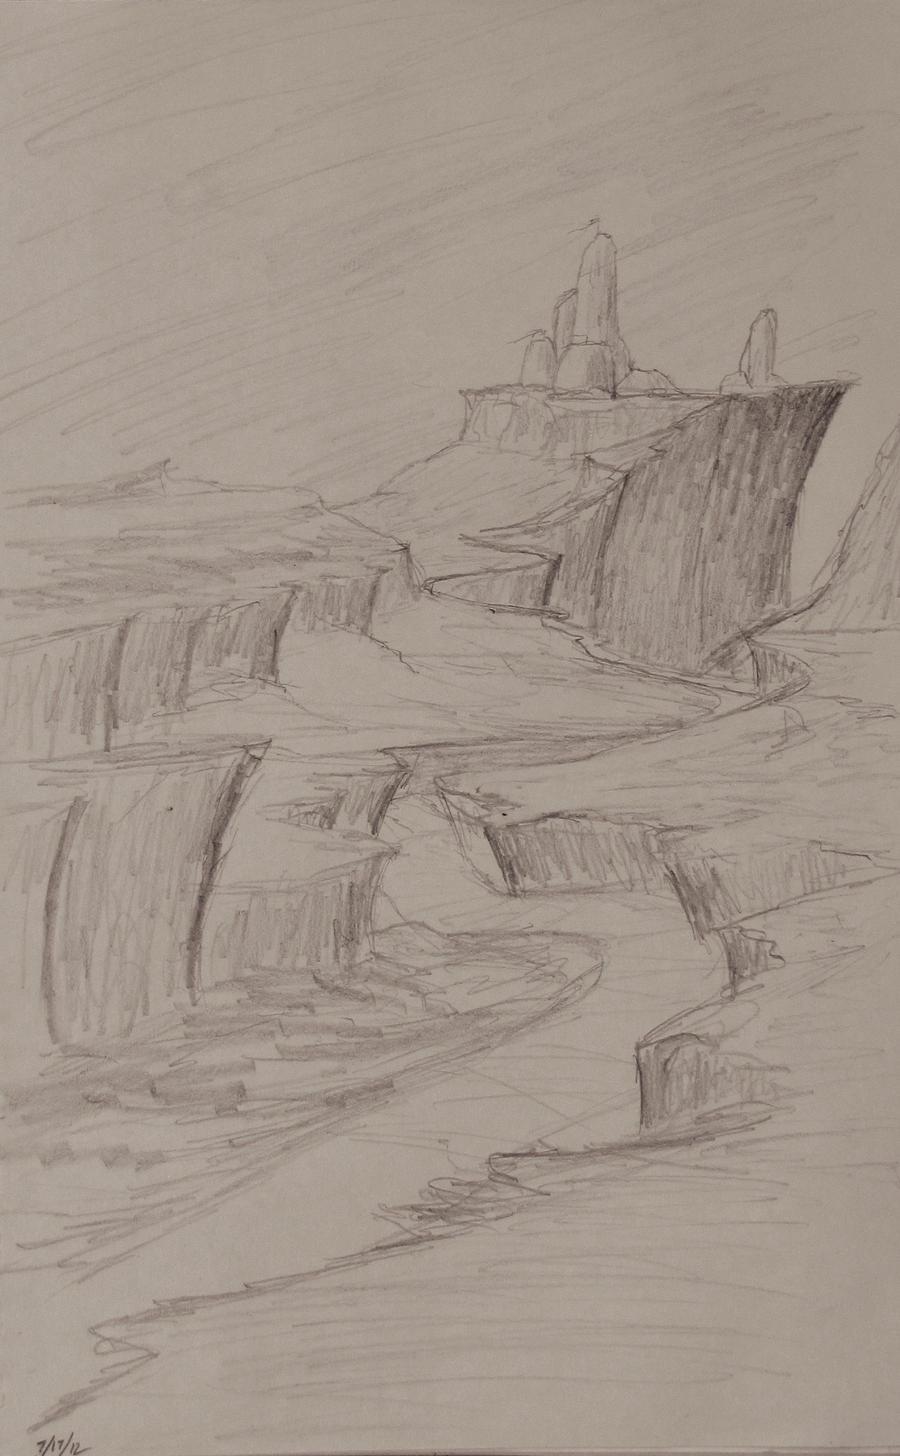 Sketch: Winding Cliffs